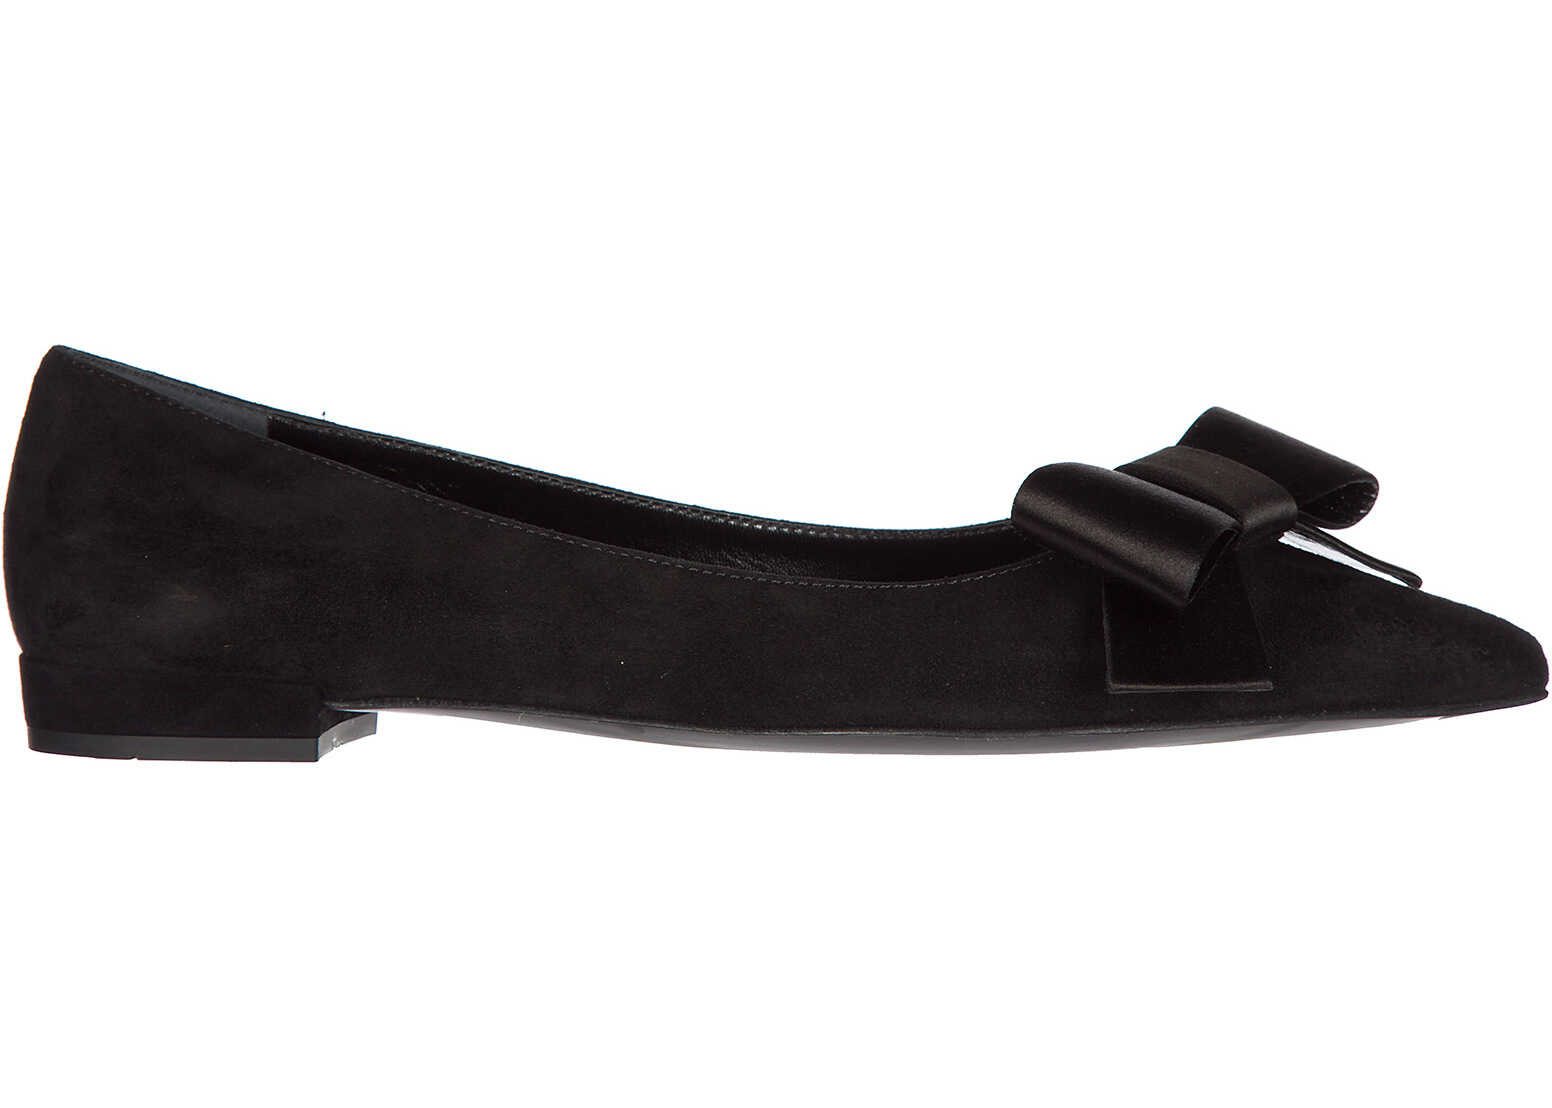 Prada Flats Ballerinas Black